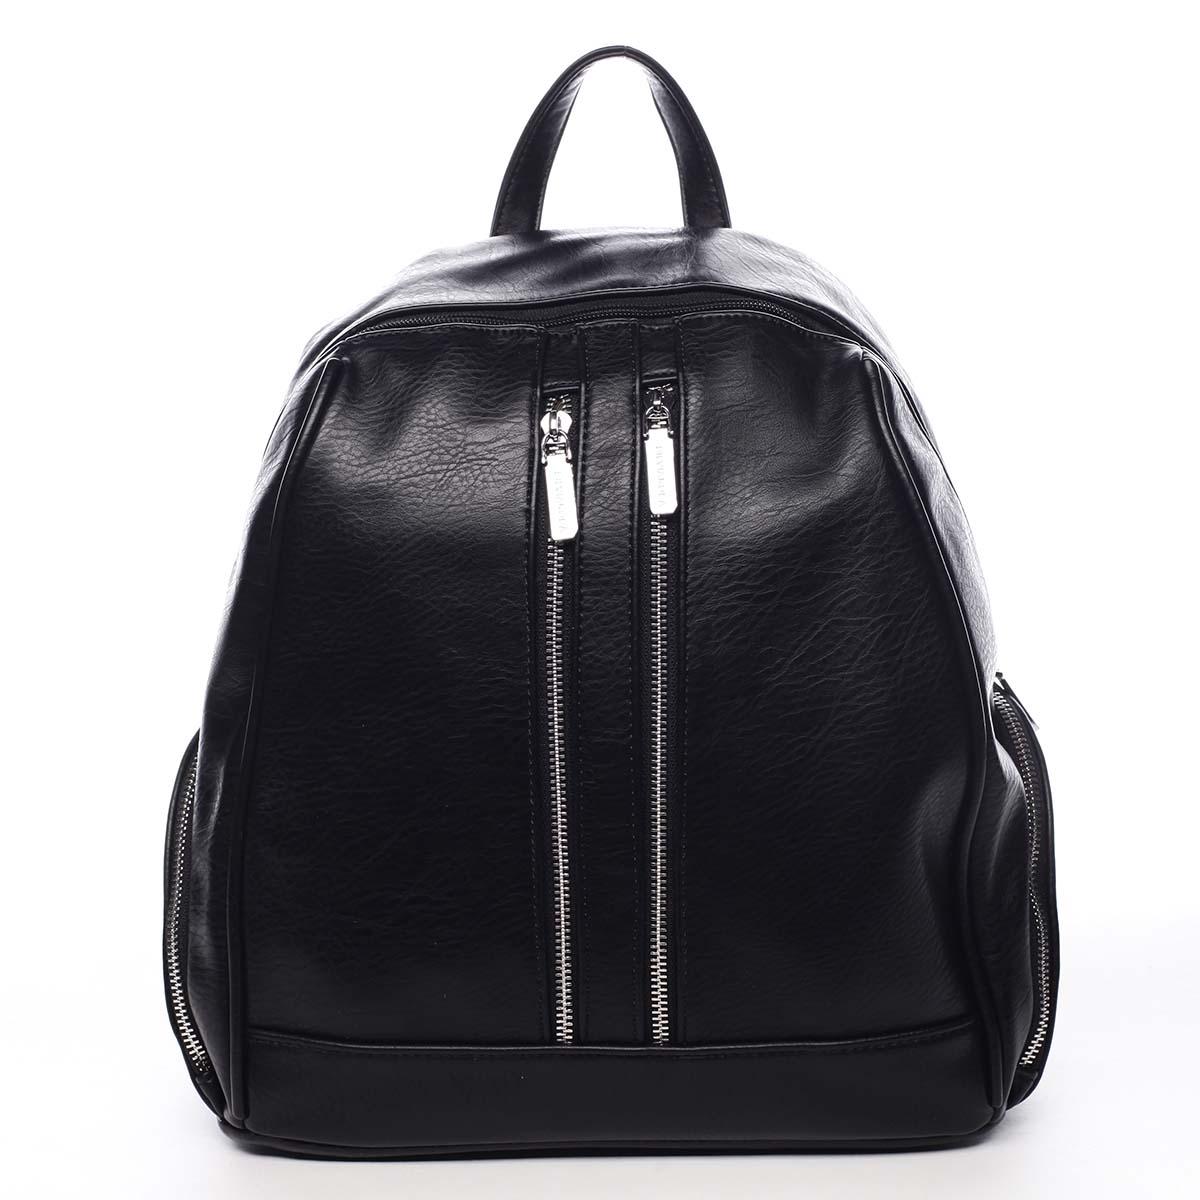 Dámsky batoh čierny - Silvia Rosa William